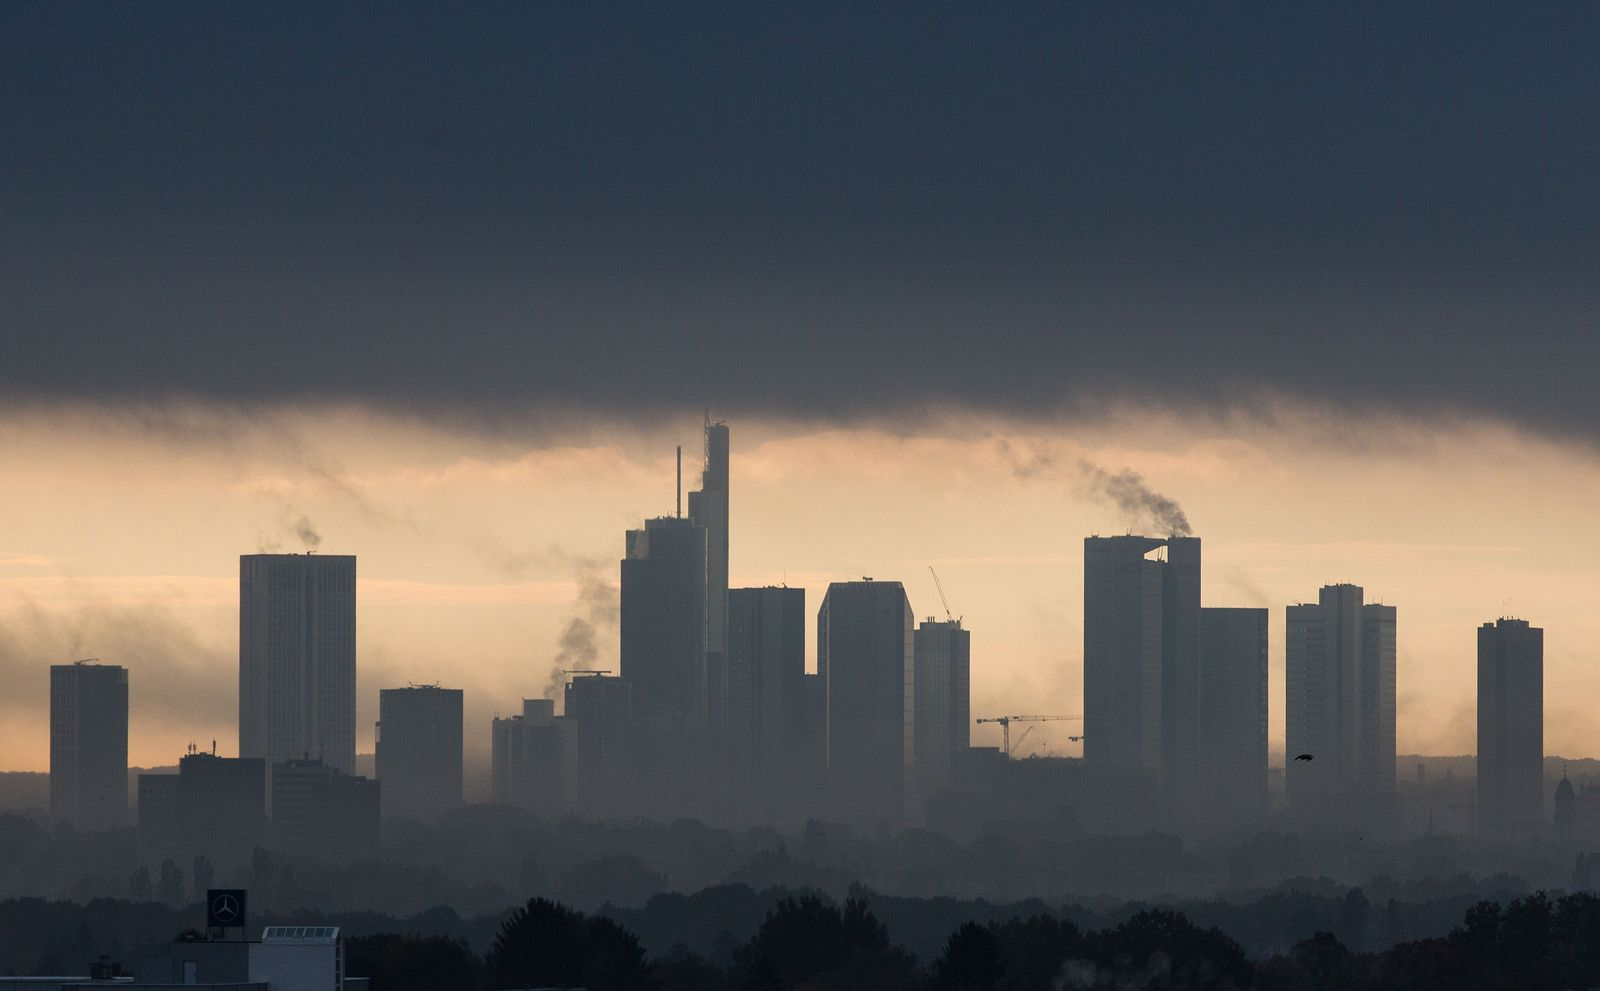 Frankfurt-Main / Skyline / Banken